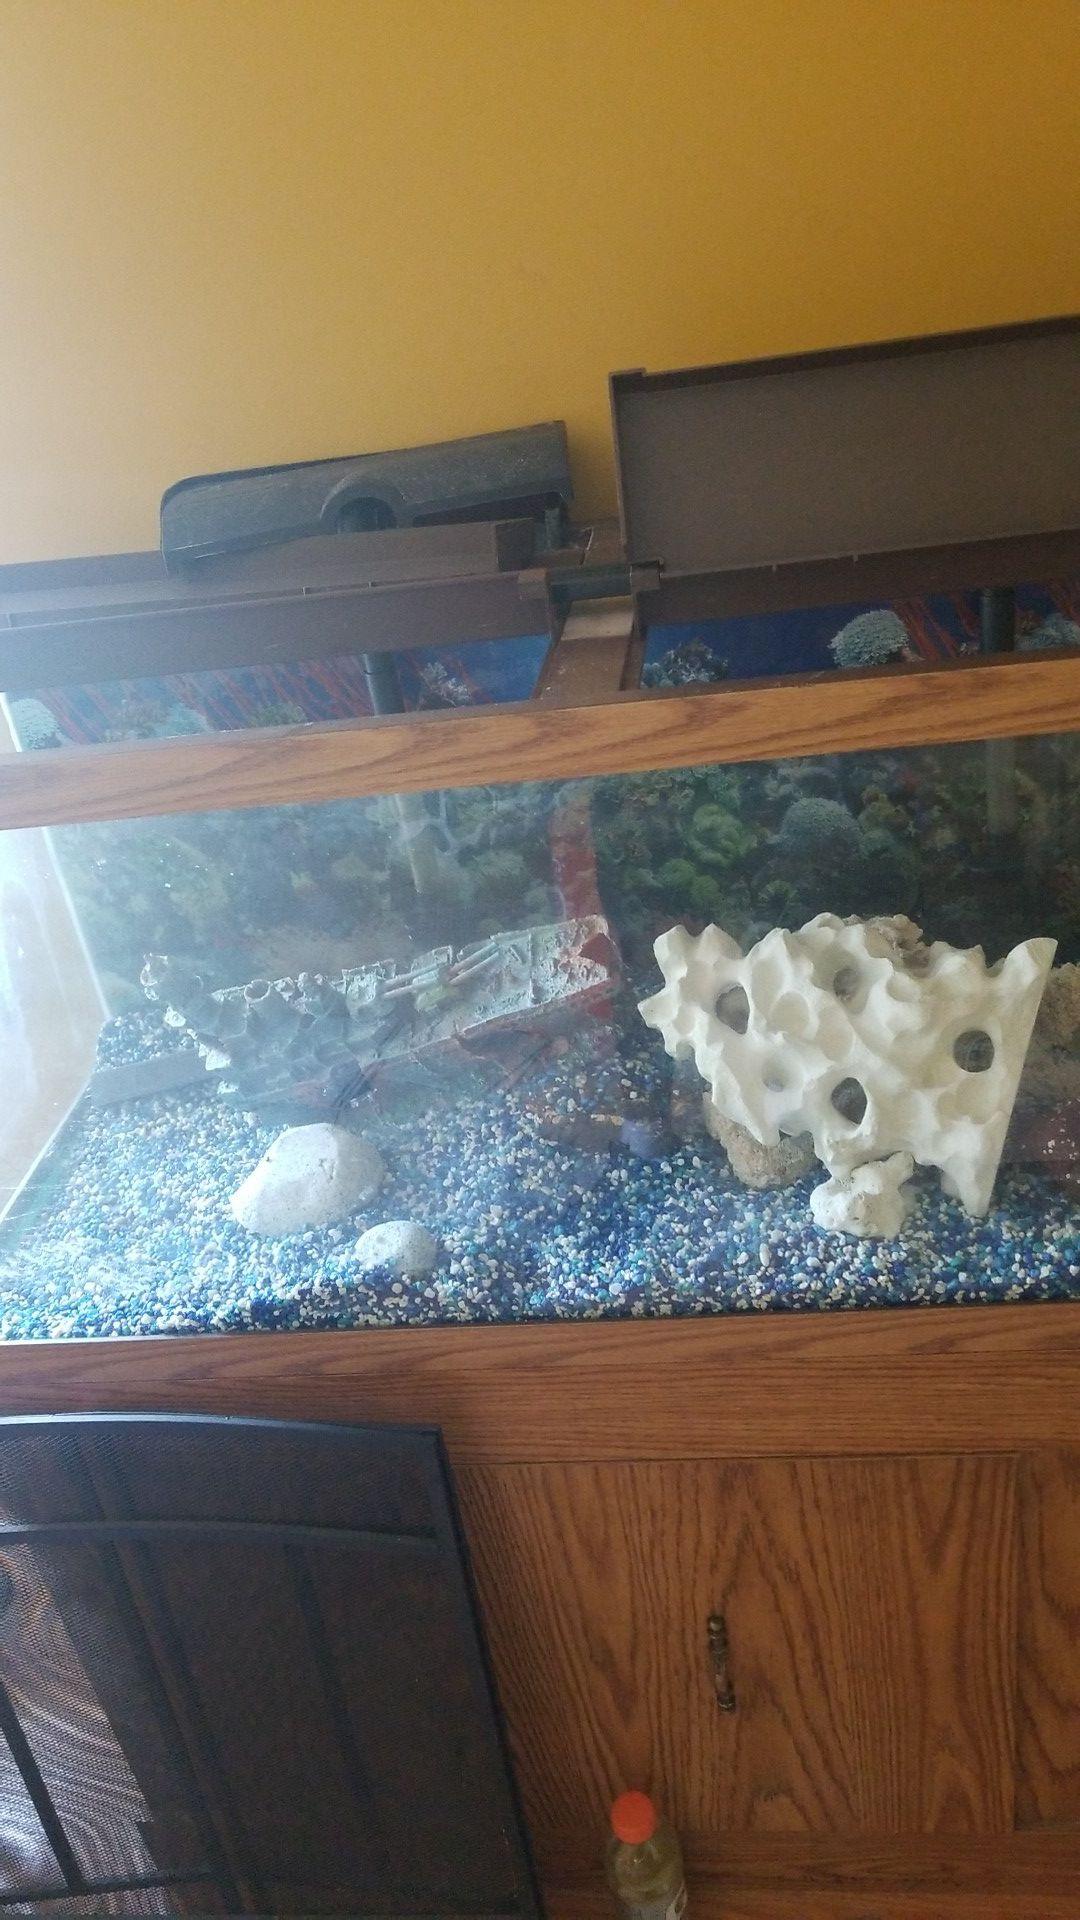 75 gallon fresh water aquarium